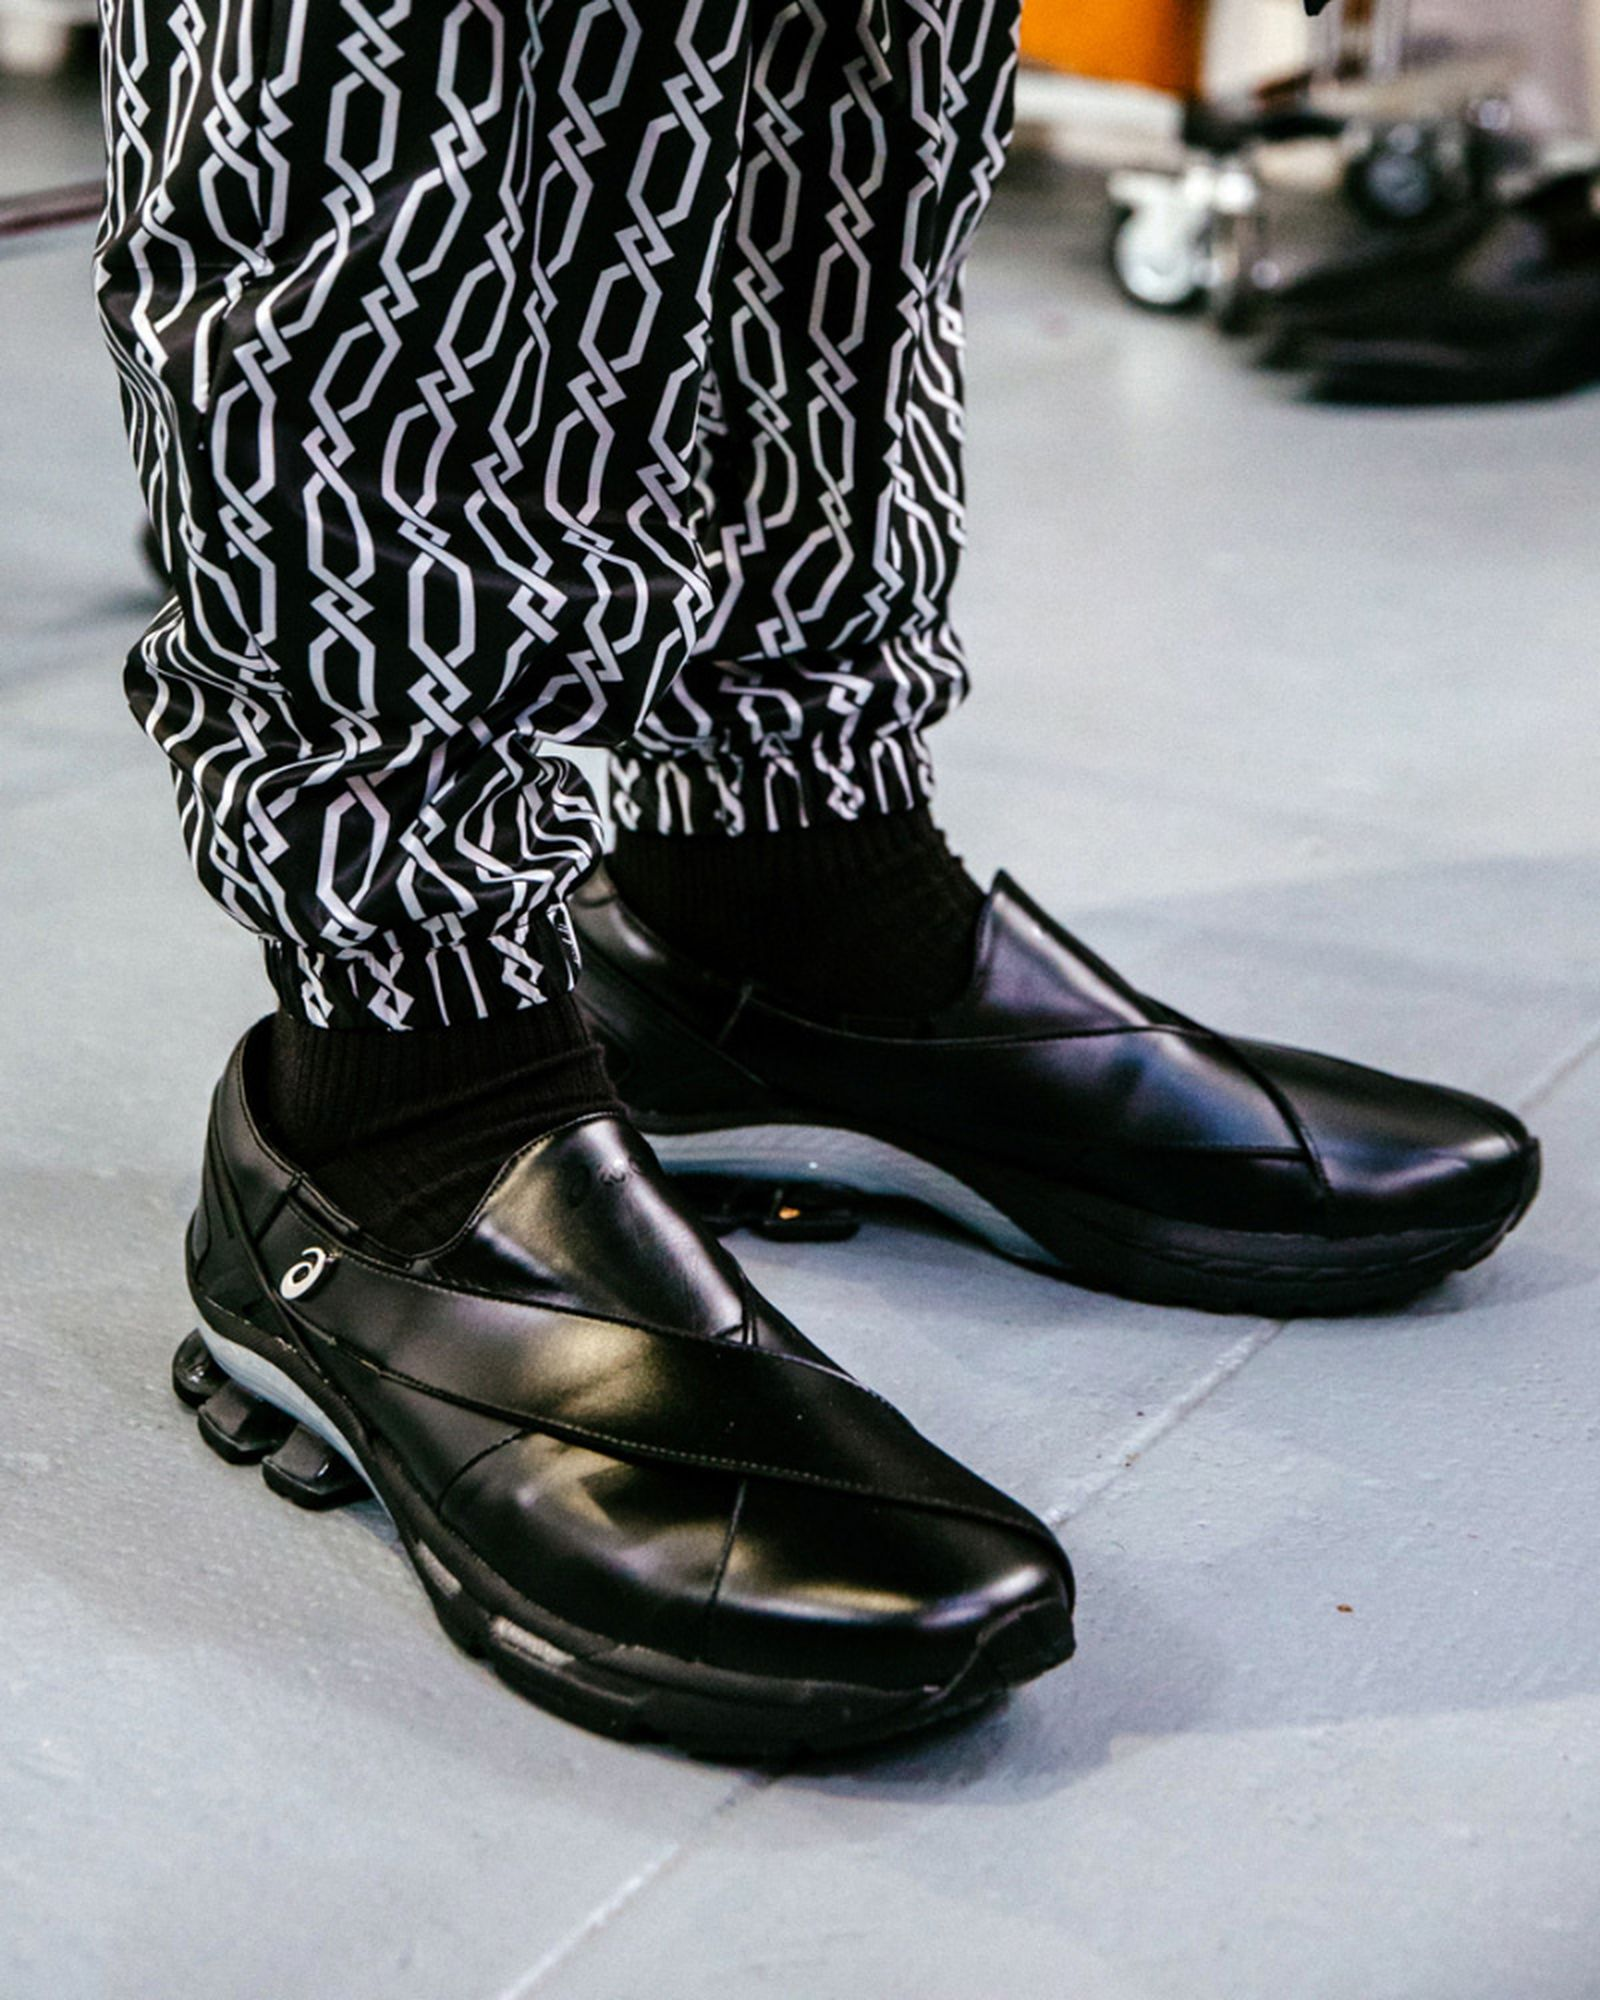 gmbh-asics-paris-fashion-week-fw20-collaboration-5